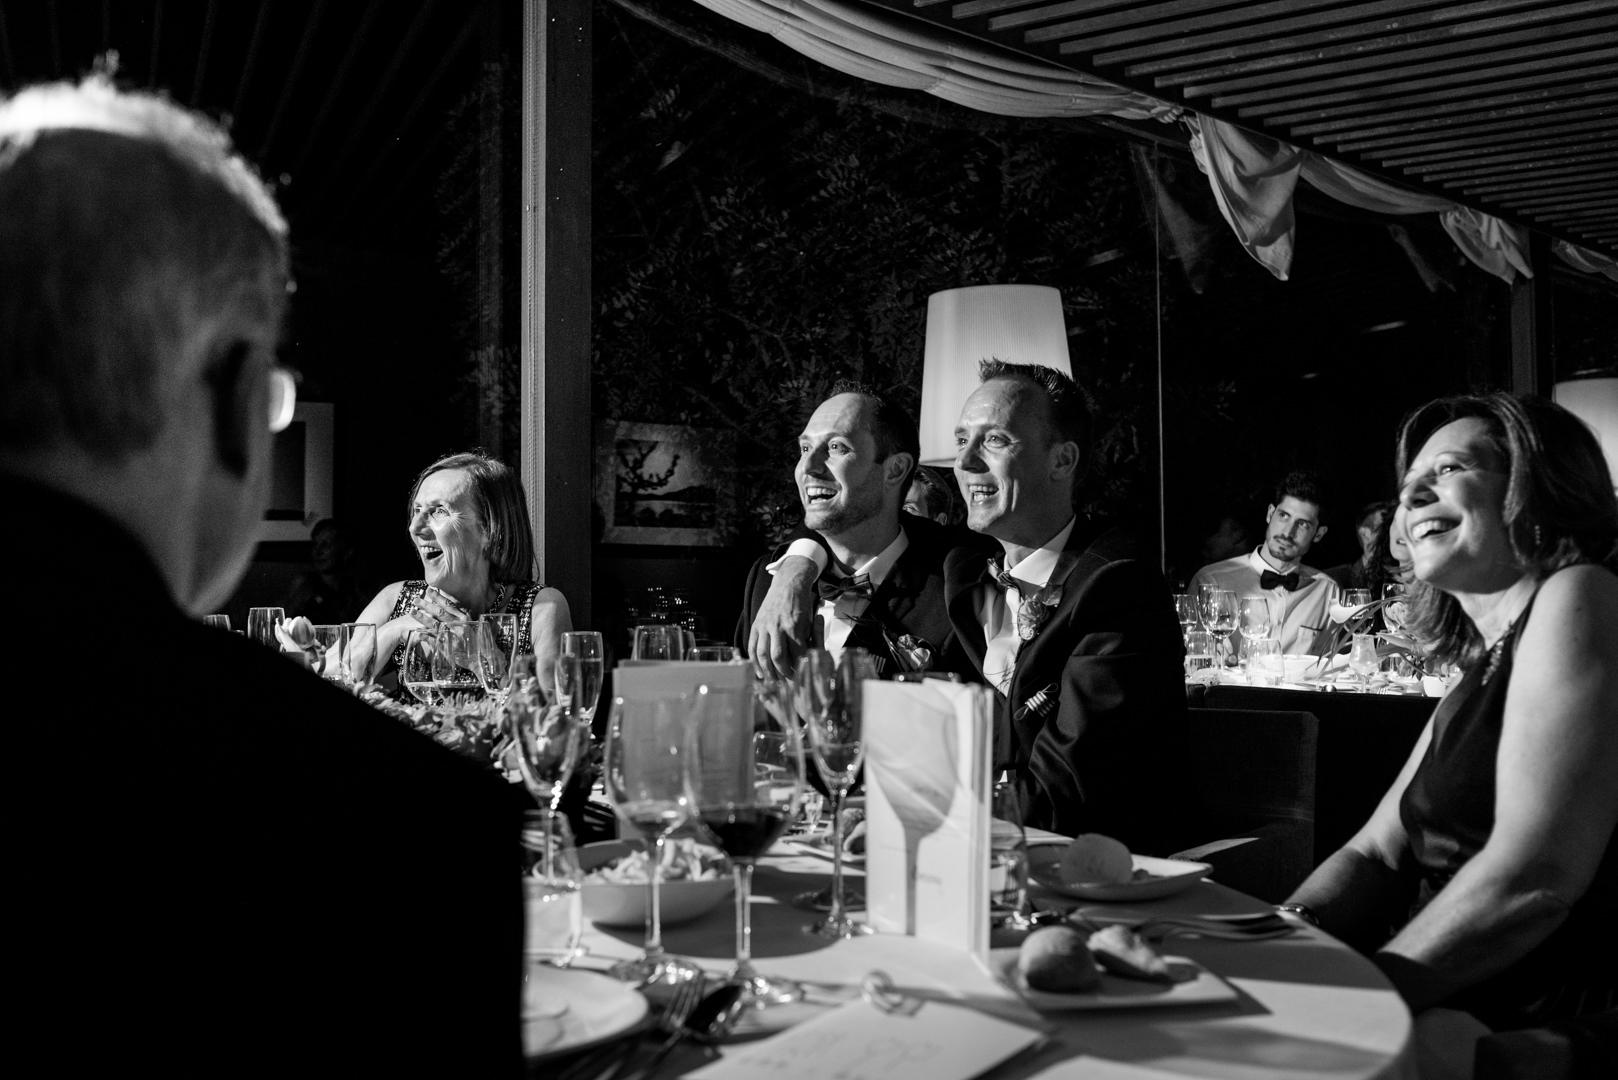 Same-sex-wedding-barcelona-boda- gay-samesex-engagement-Rafael-Torres-fotografo-bodas-sevilla-madrid-barcelona-wedding-photographer--53.jpg